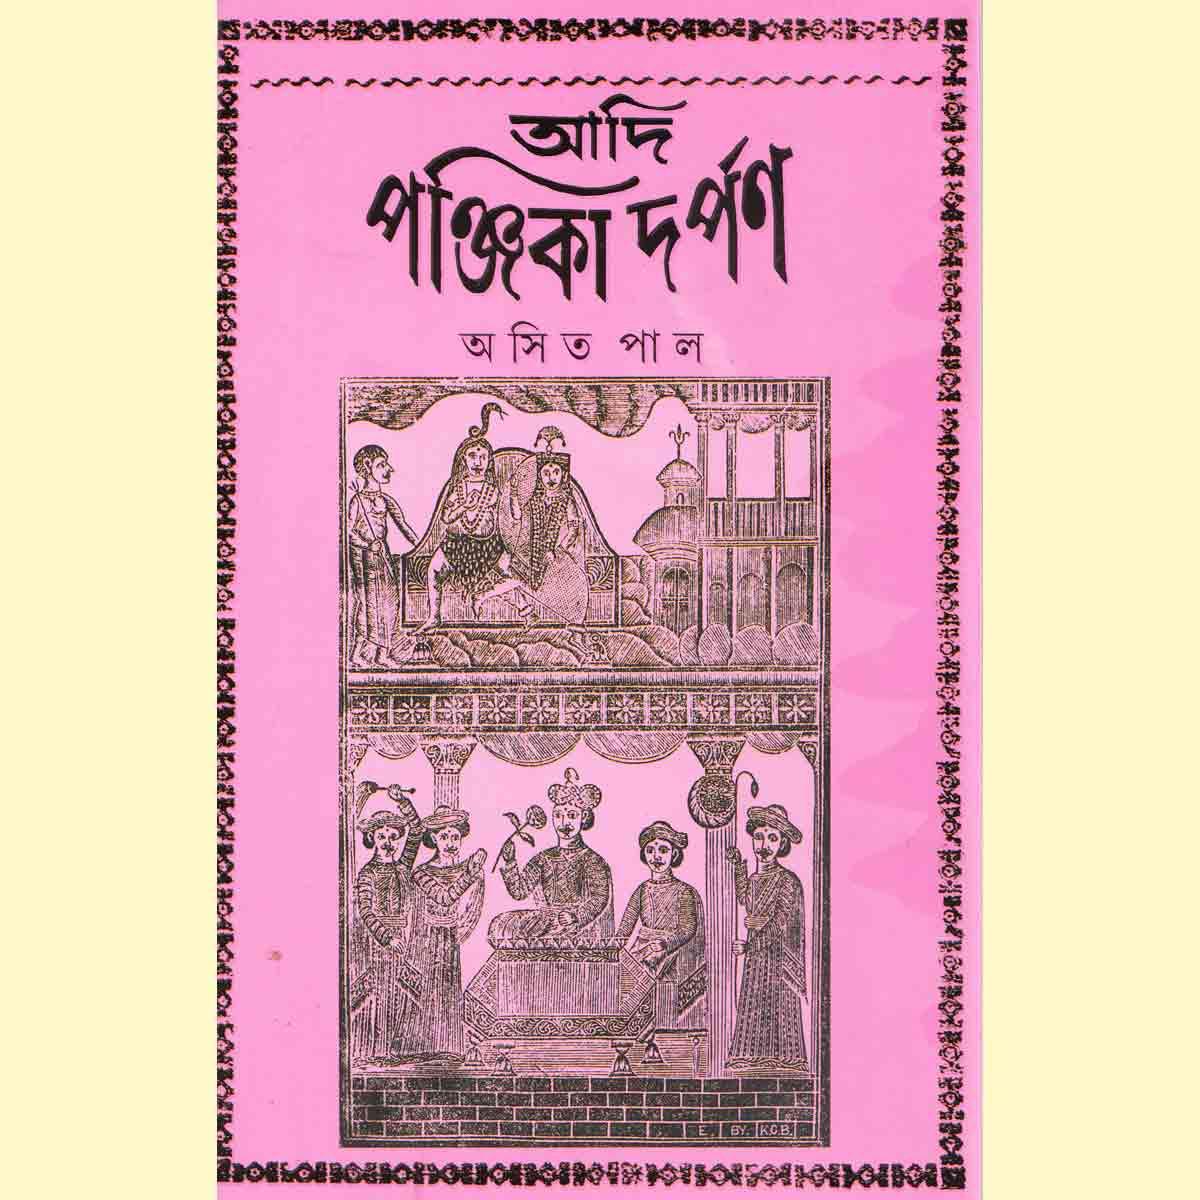 Adi Panjika Darpan / আদি পঞ্জিকা দর্পণ